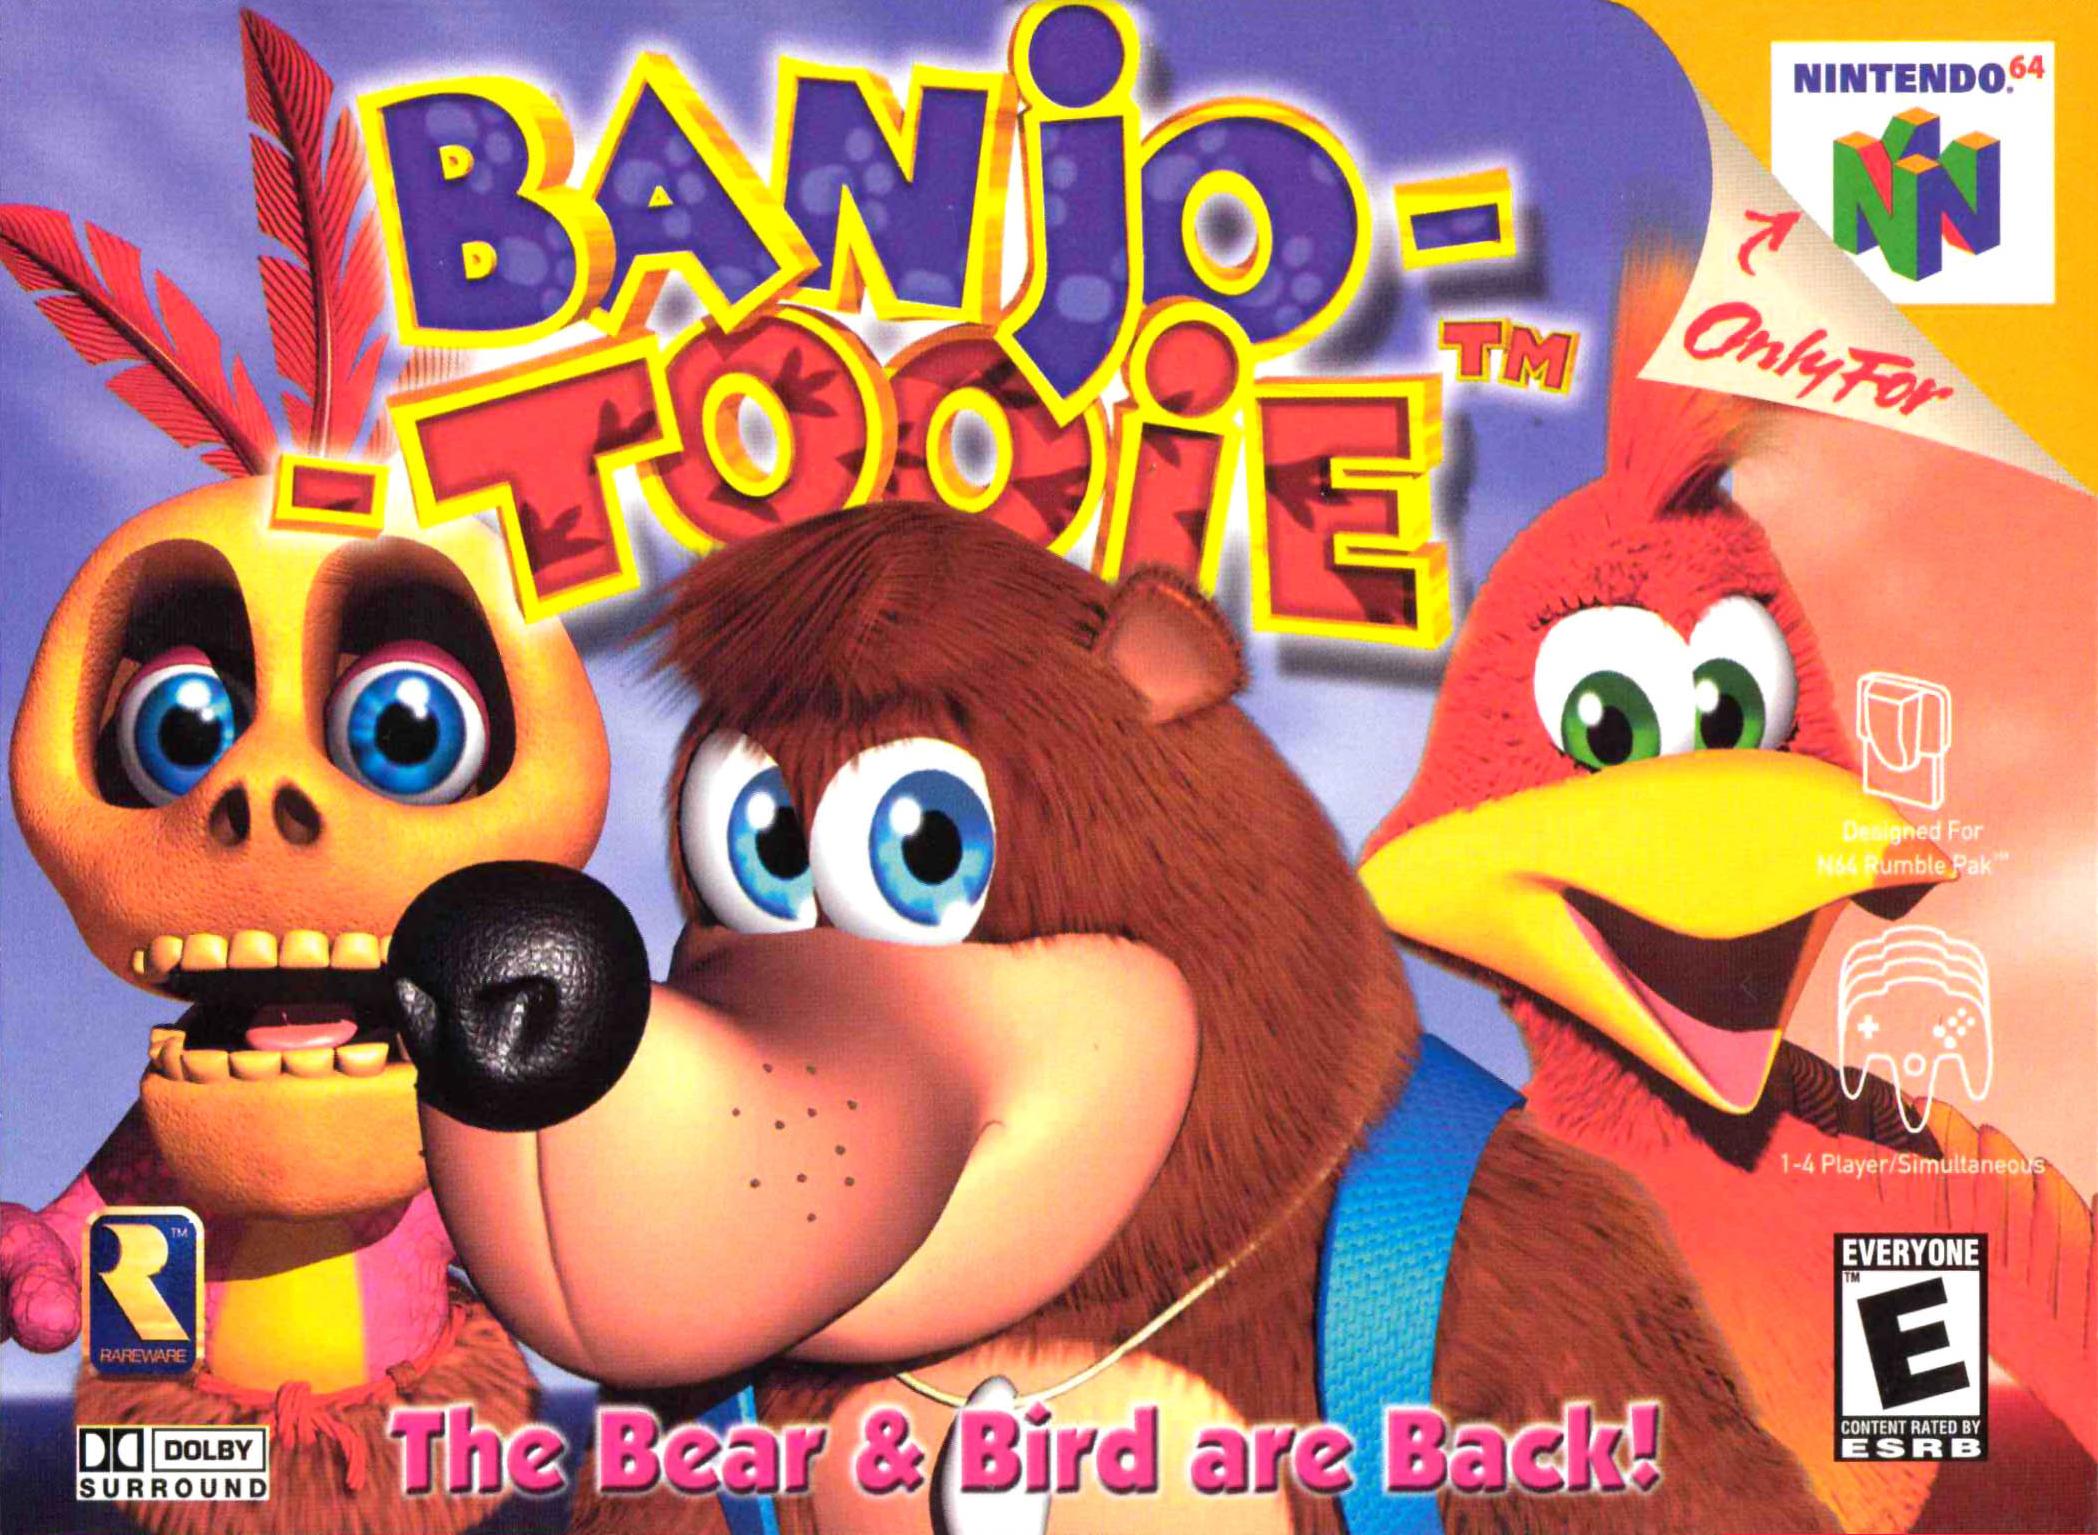 Banjo Tooie Nintendo 64 Games N64 Games Banjo Kazooie